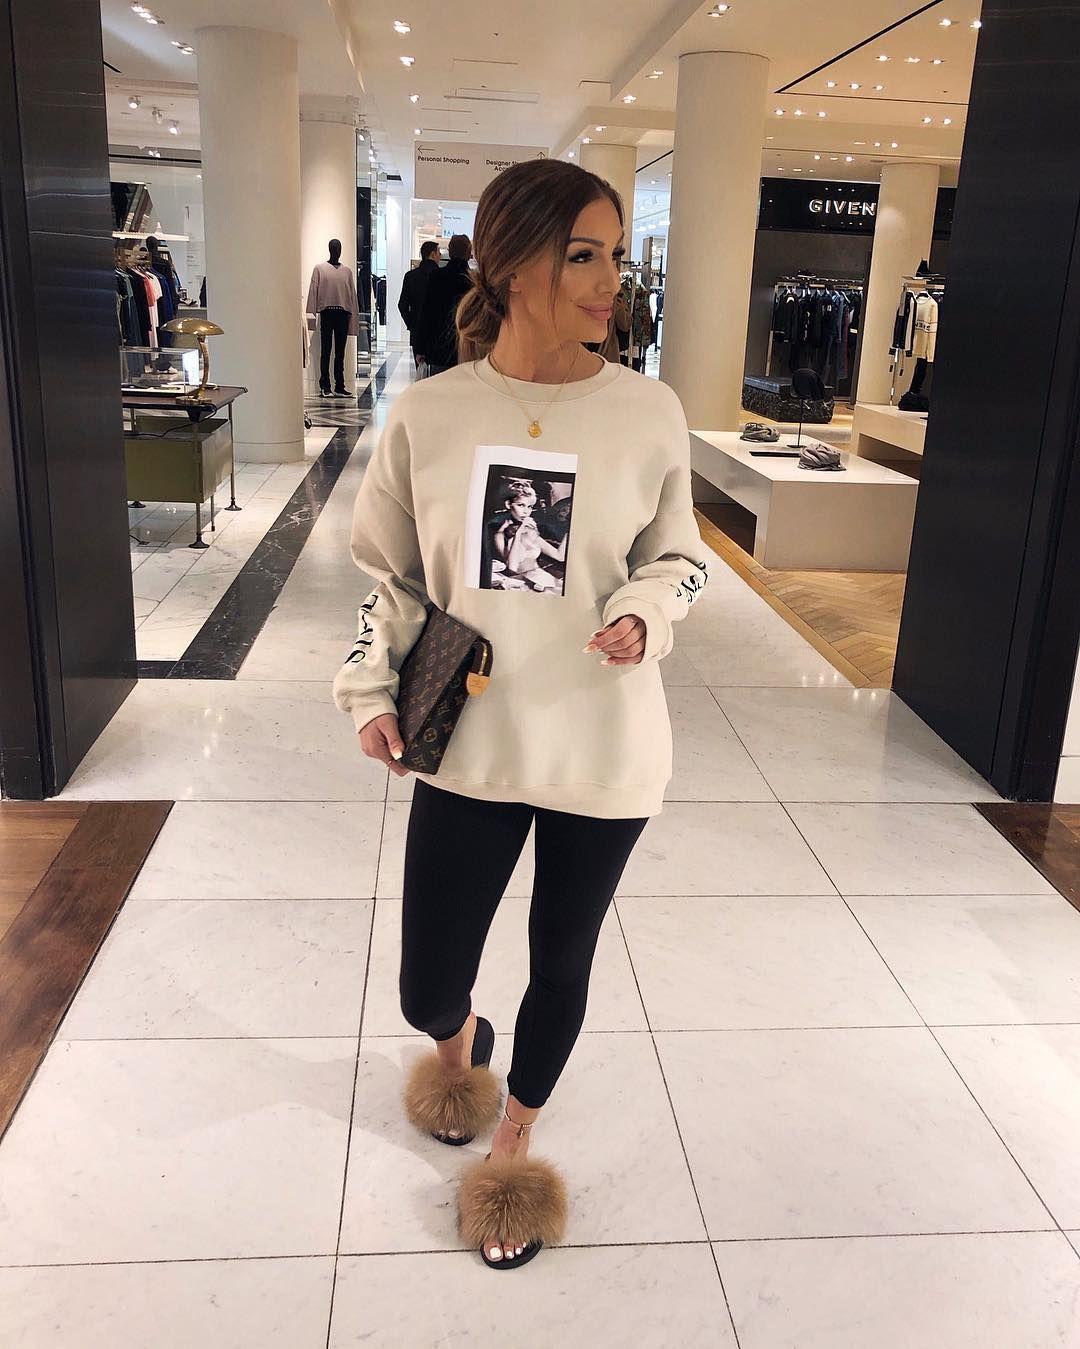 Fashion Trendy Instagram Pics